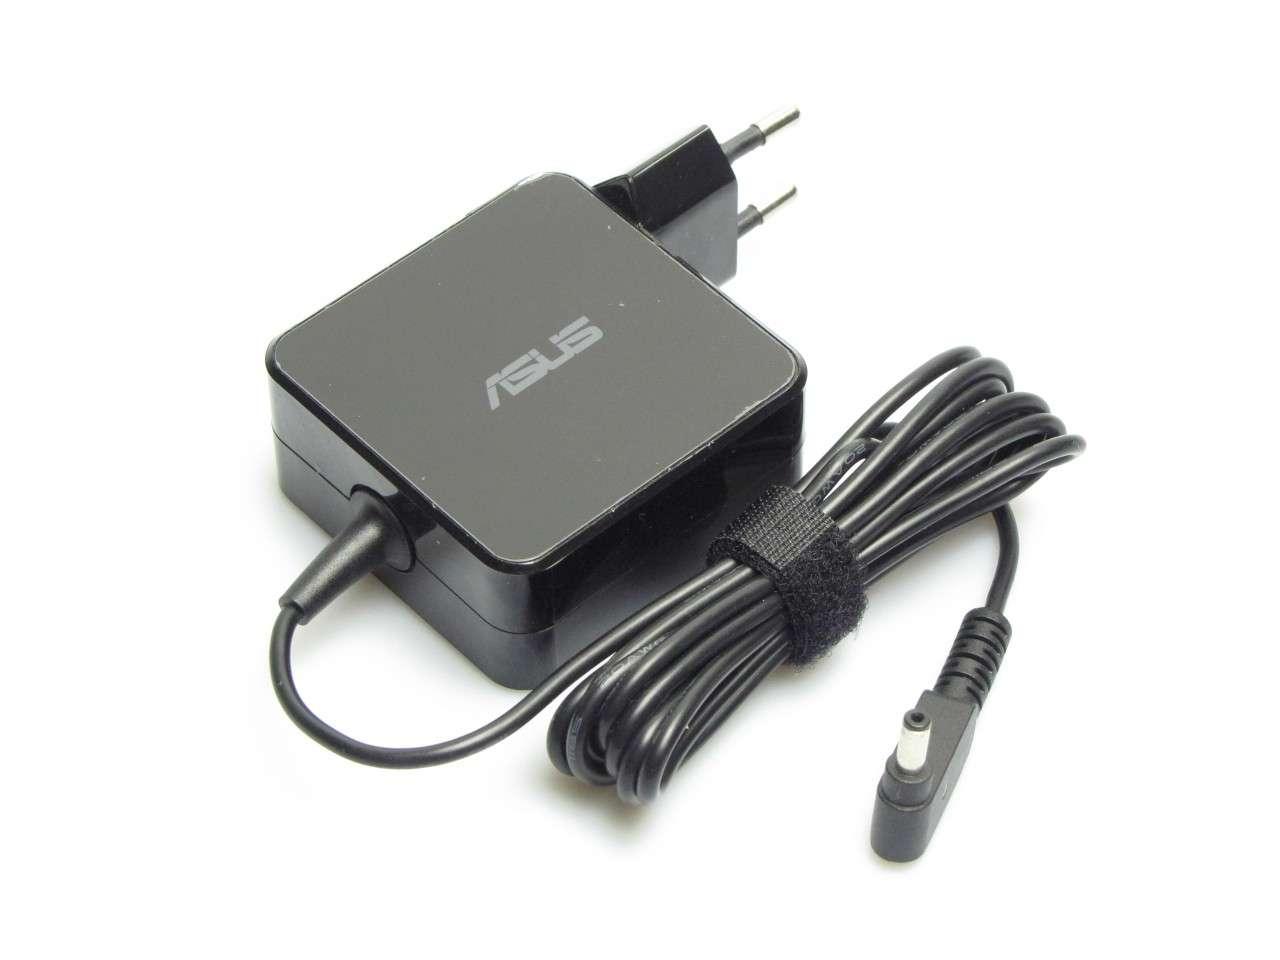 Incarcator Asus R414SA Square Shape 65W imagine powerlaptop.ro 2021